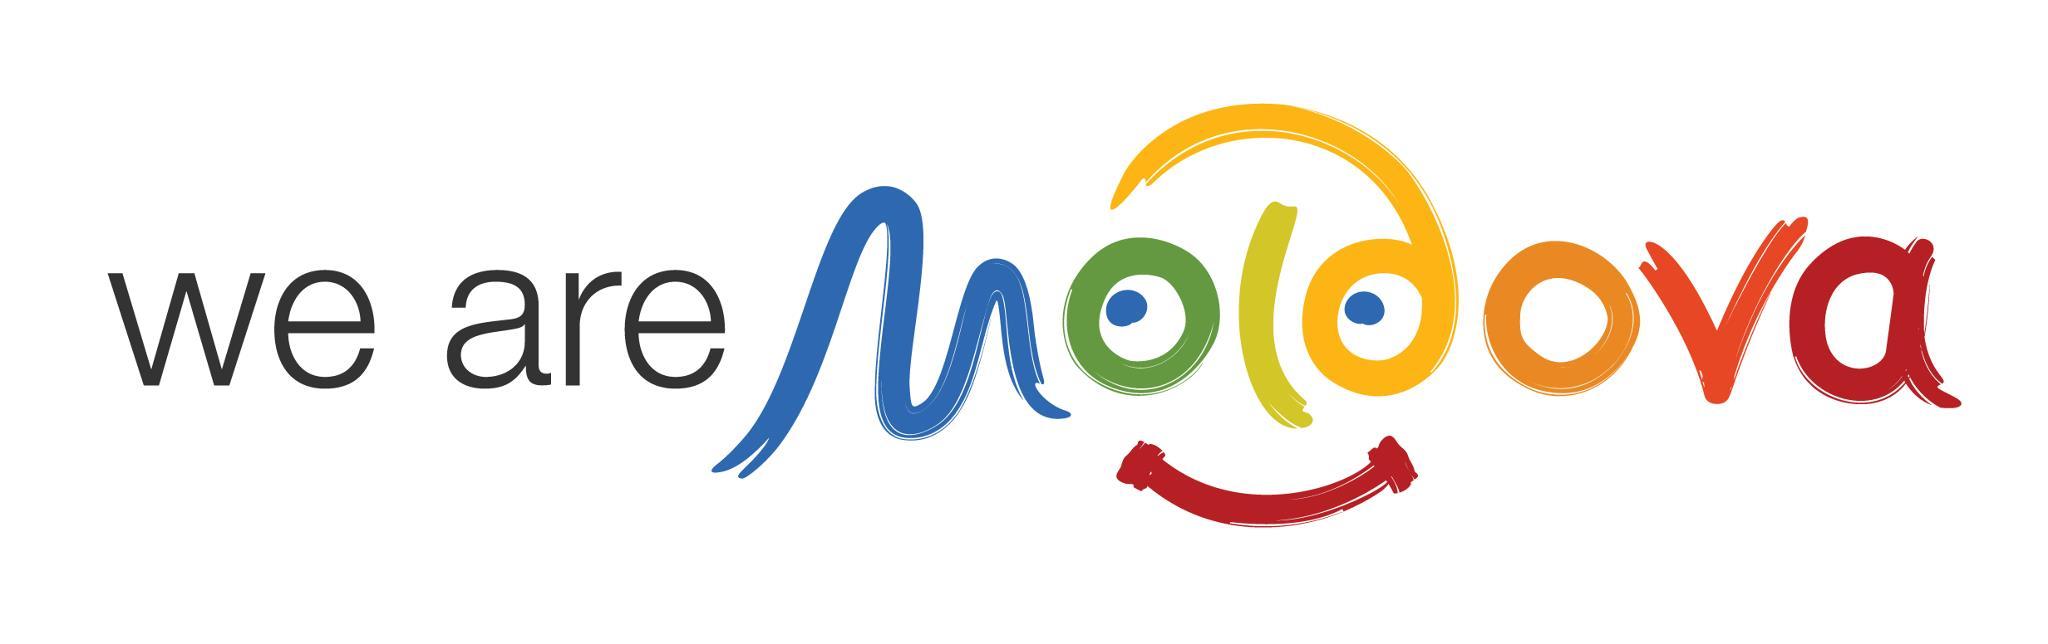 We are Moldova